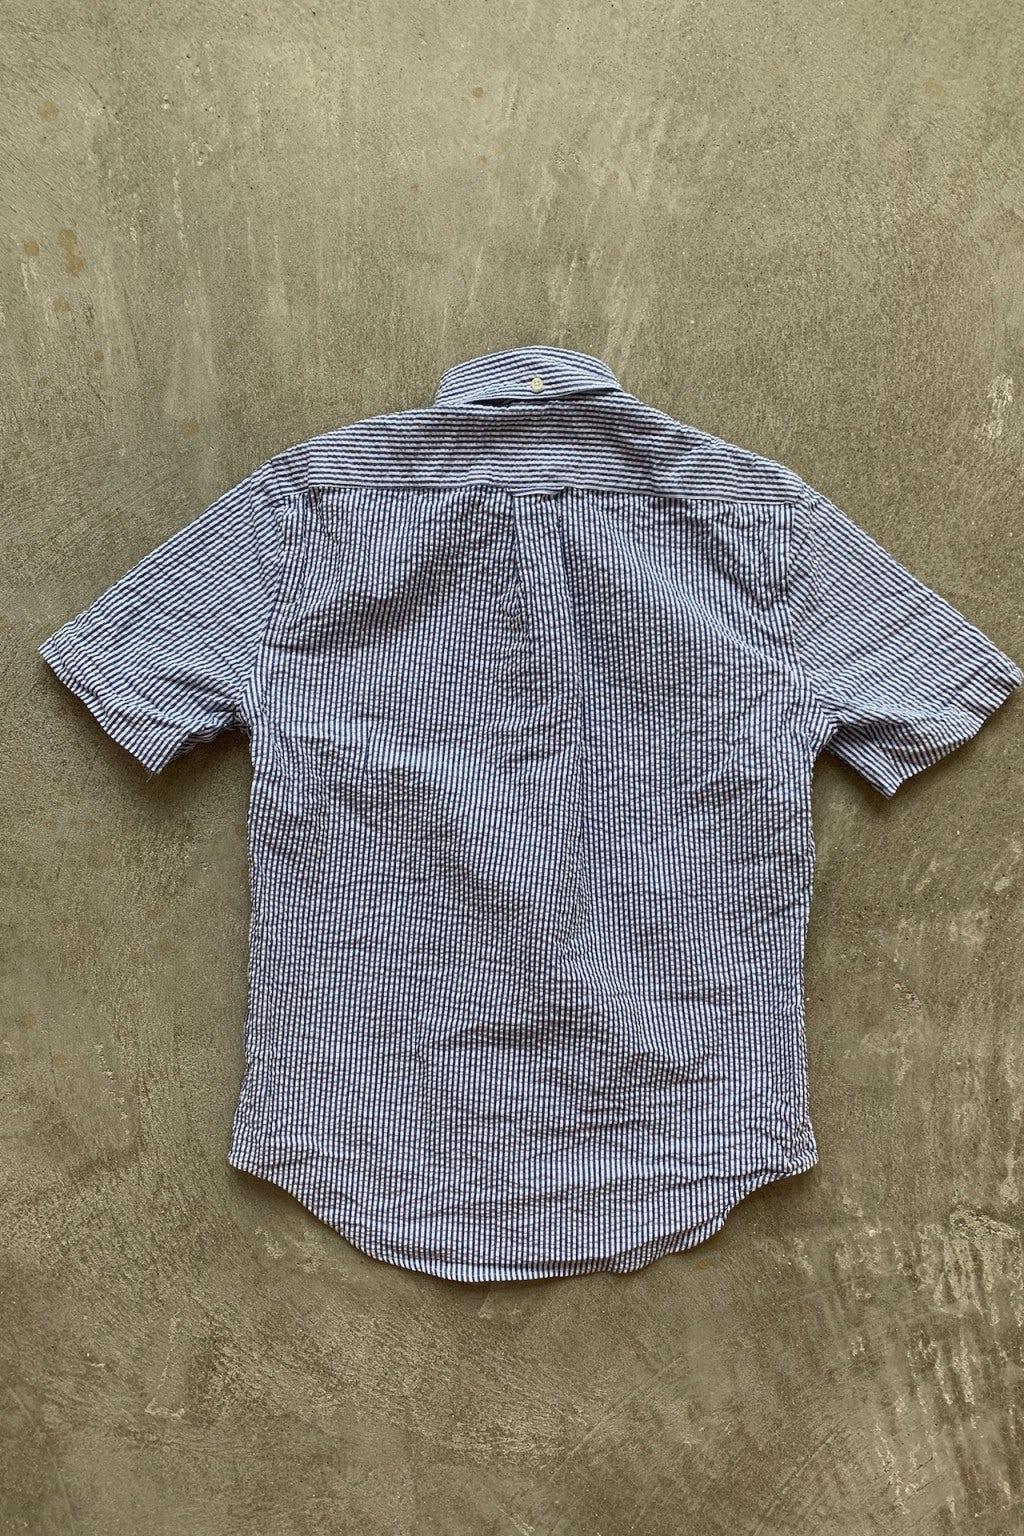 Gitman Bros. Vintage Short Sleeve Shirt  Blue/White Stripe Seersucker